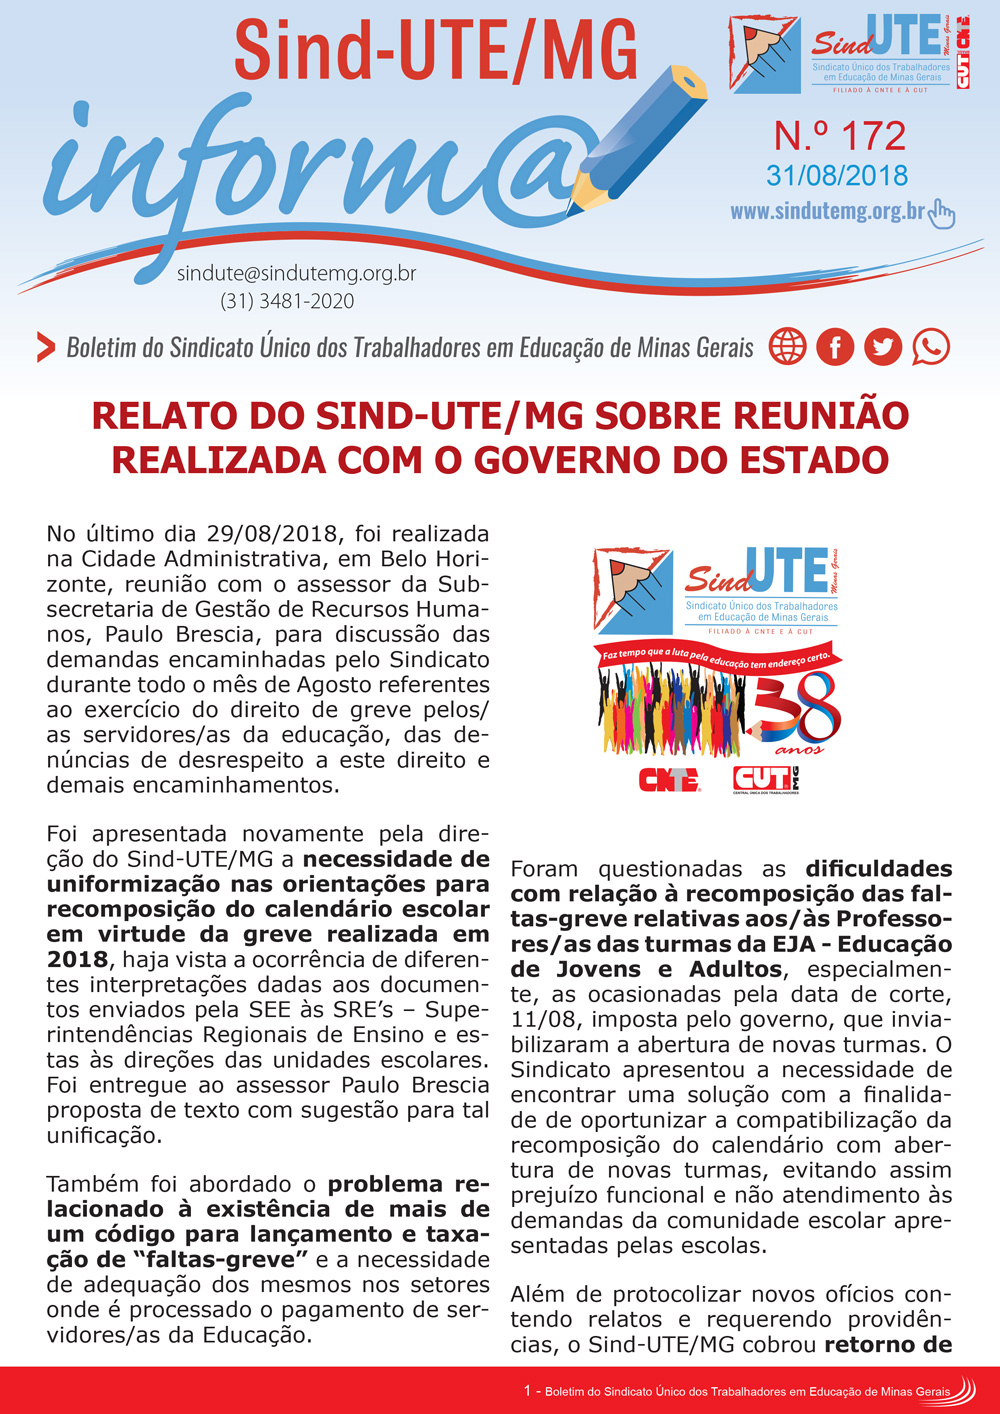 Boletim Inform@ nº 172 - Estadual